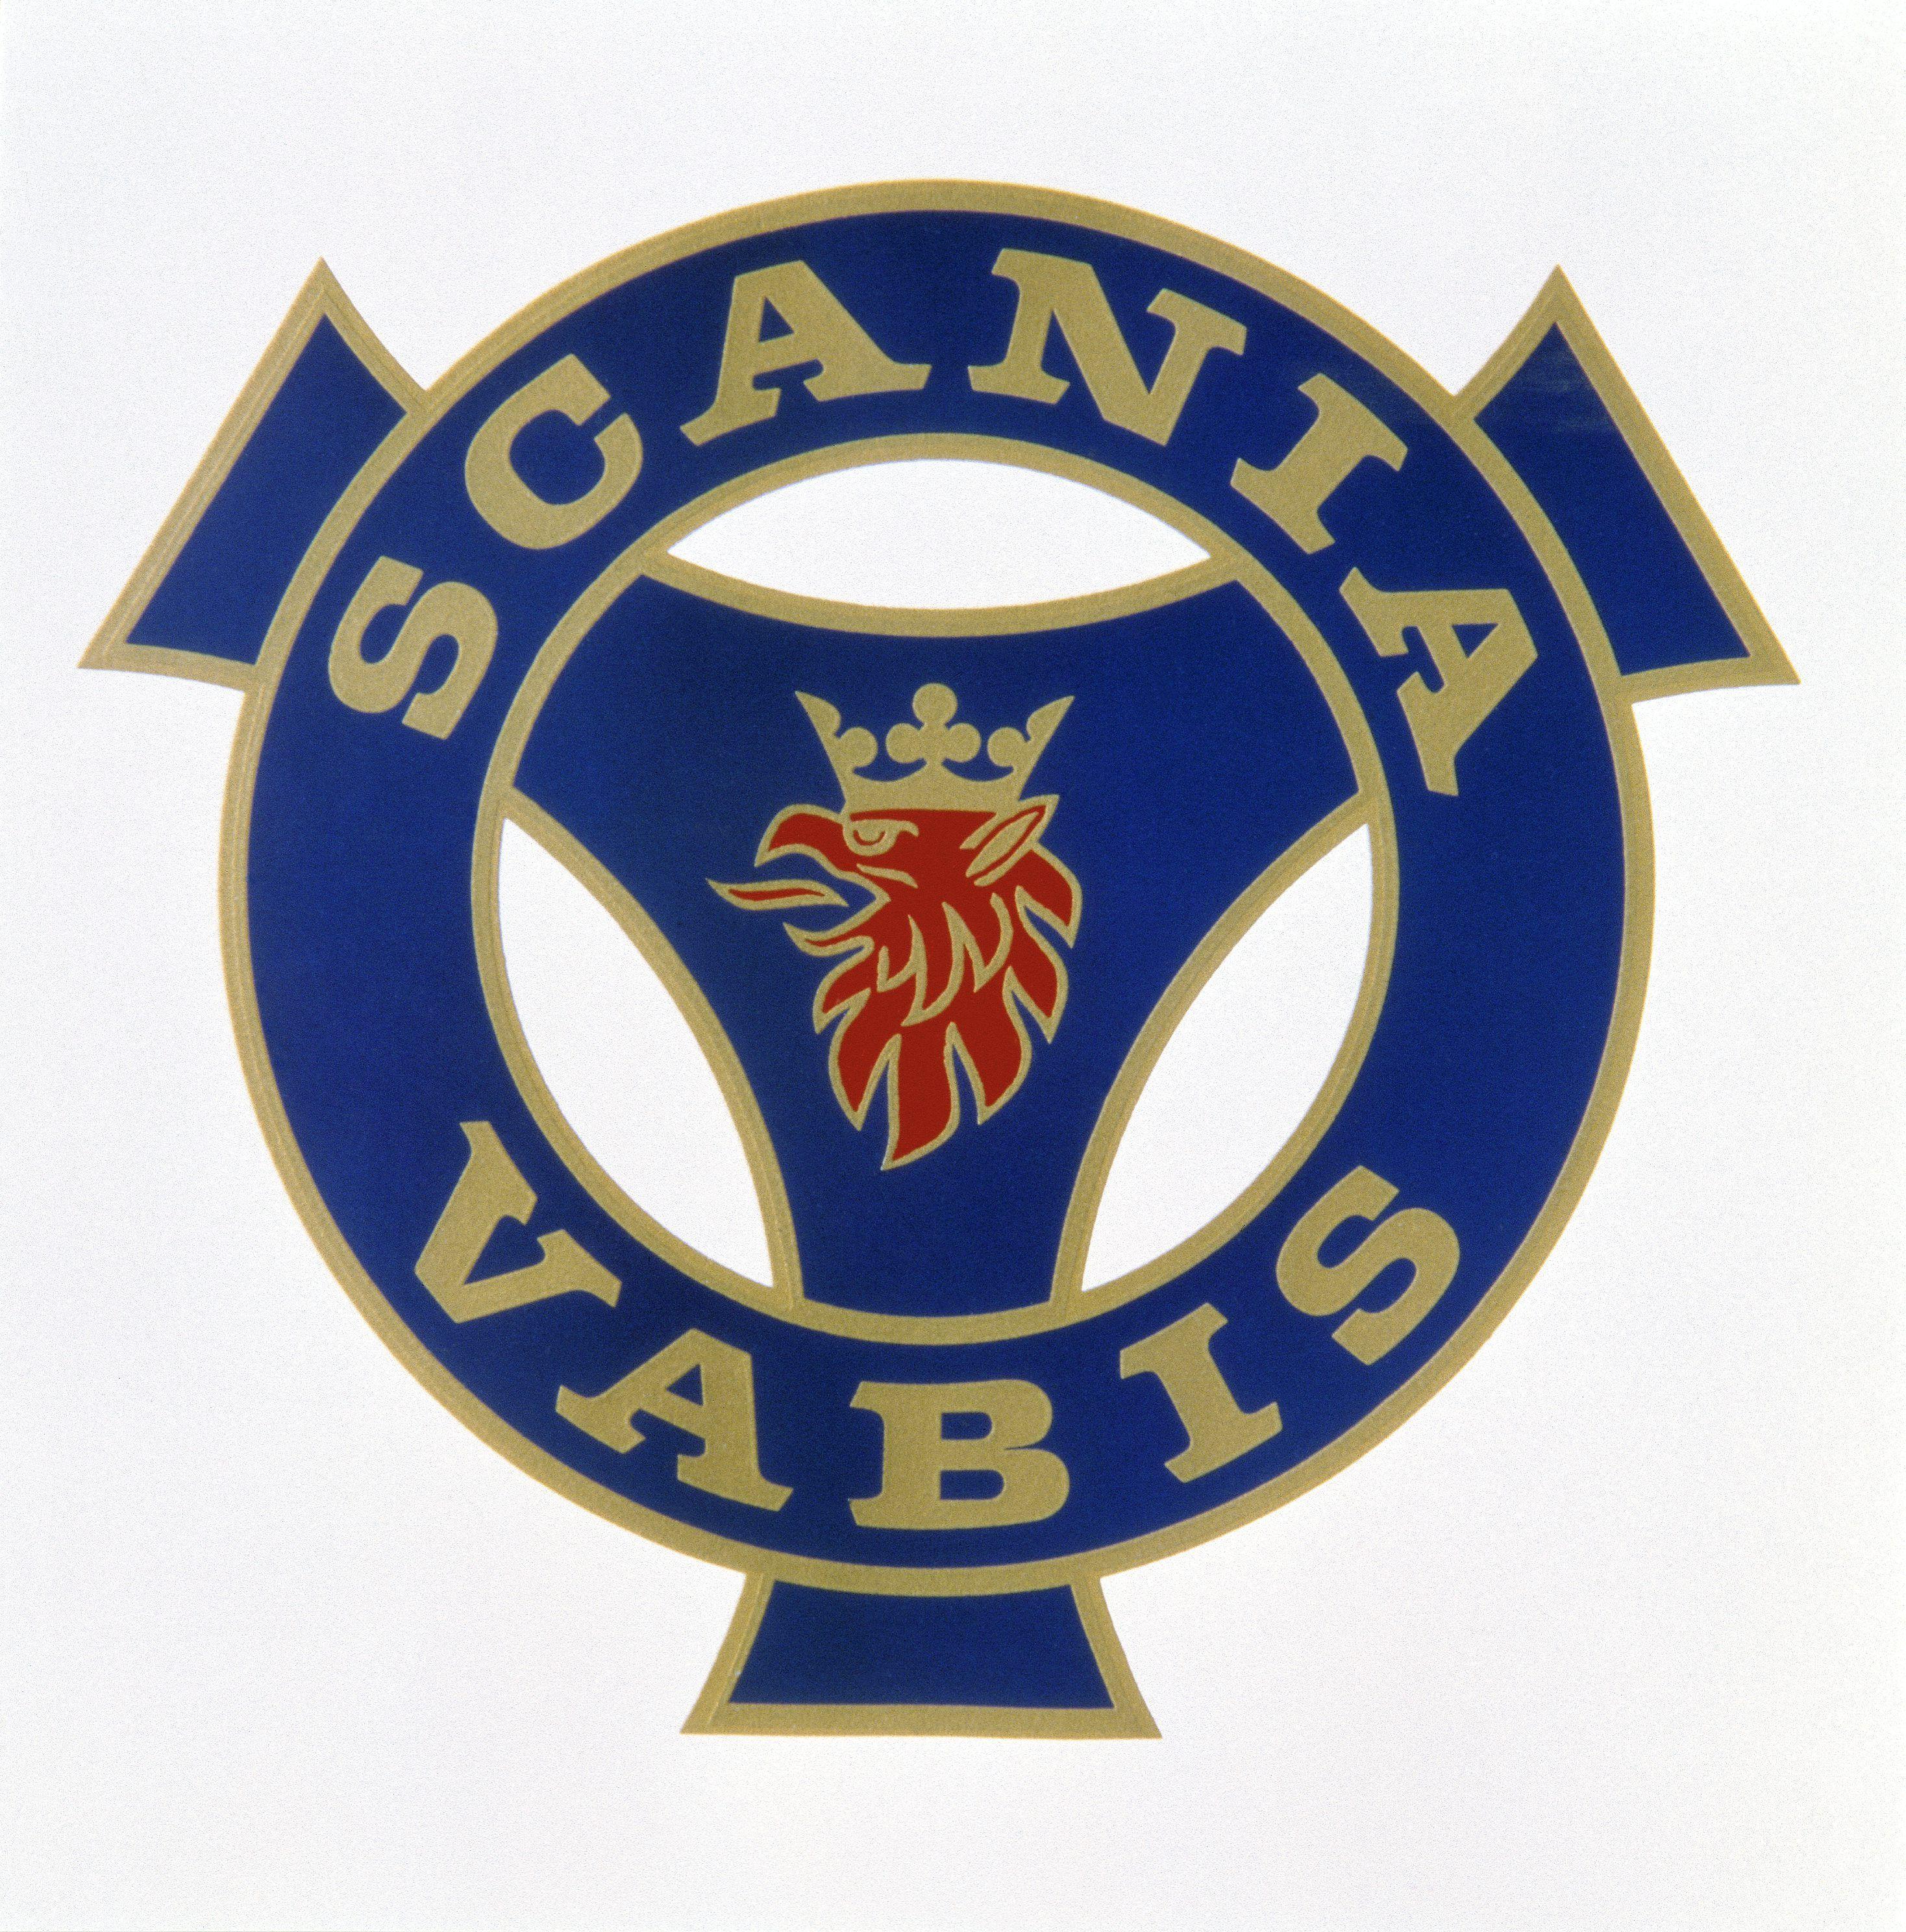 Scania Vabis Logo 3 Scania Vabis Logo Auto Scania